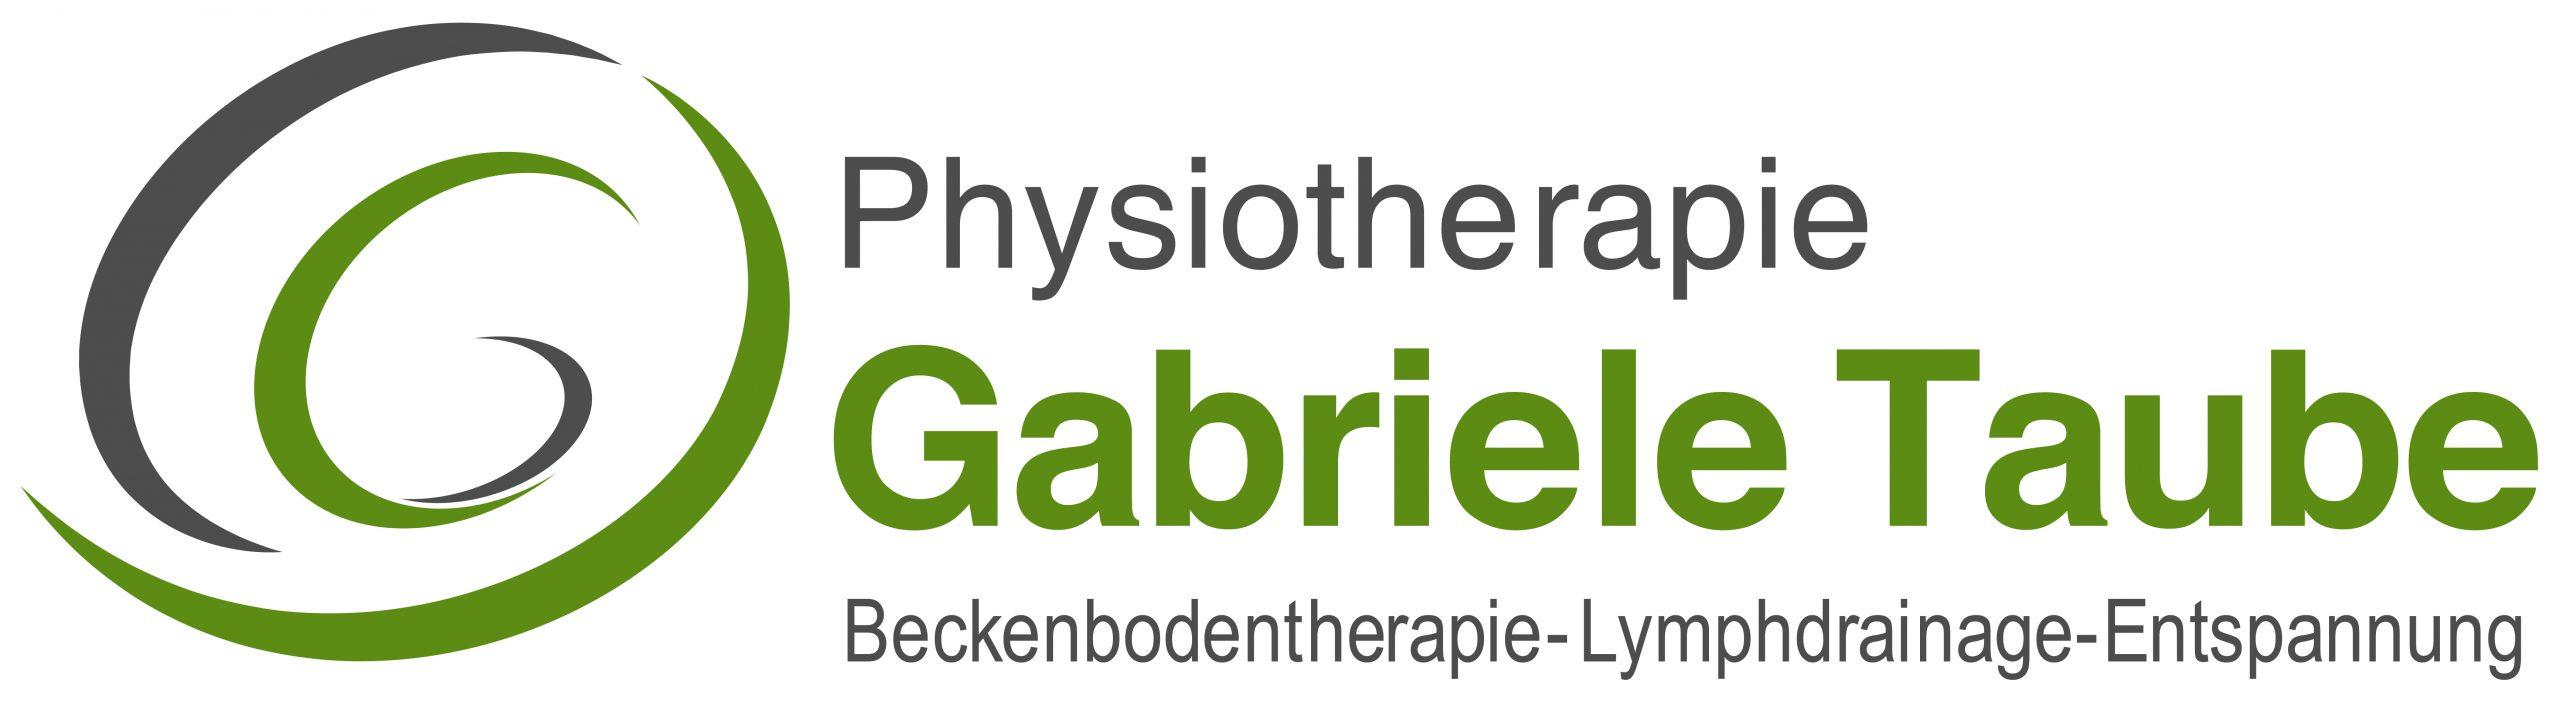 Physiotherapie Gabriele Taube Göttingen